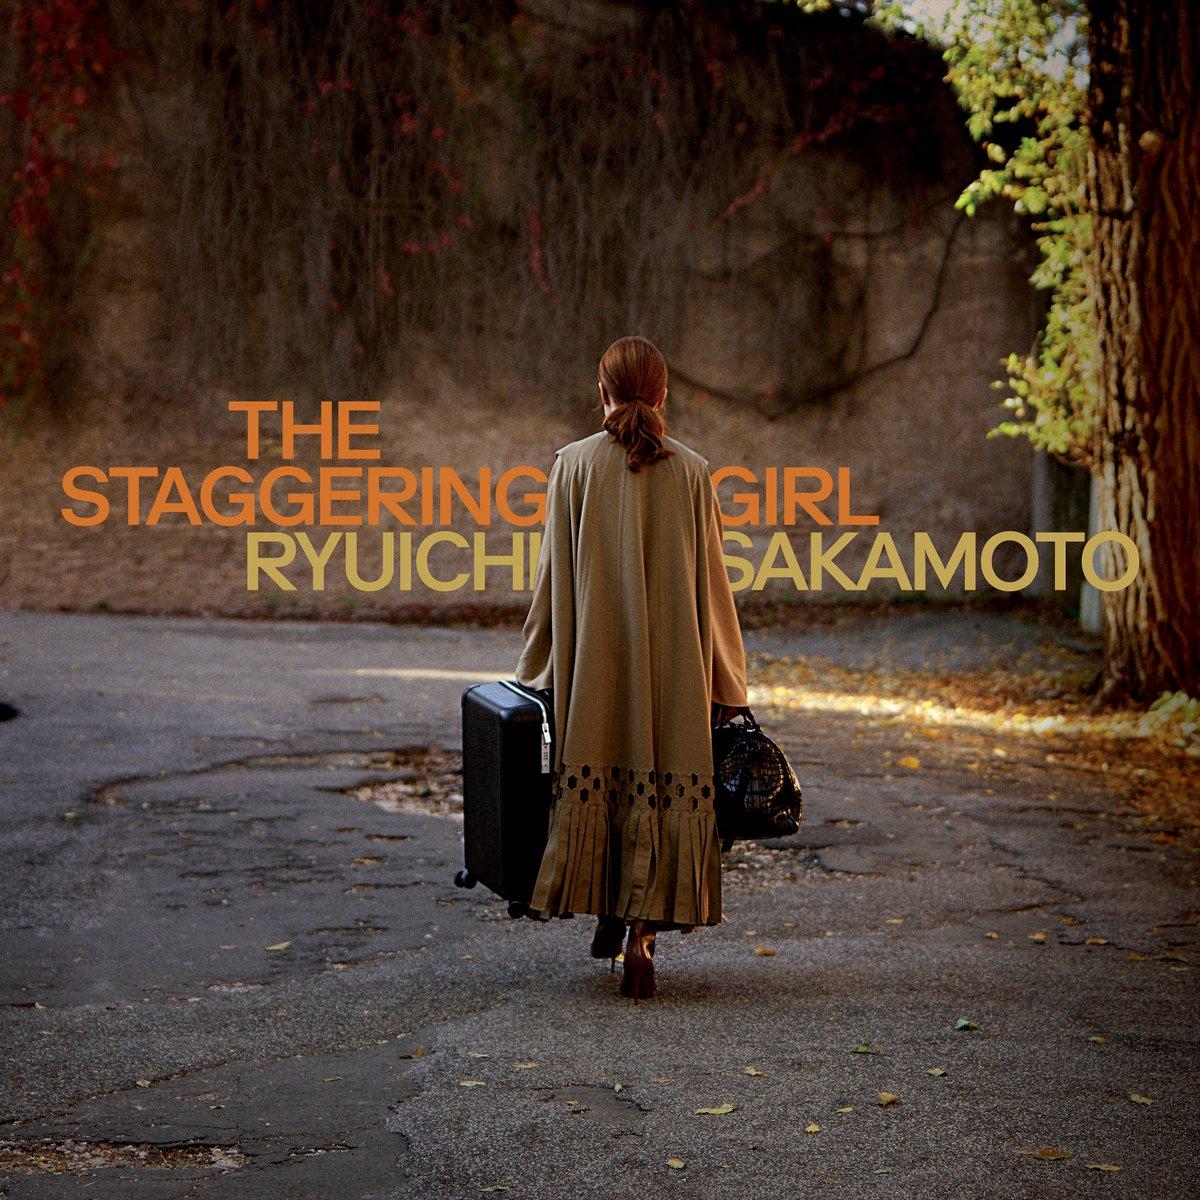 Ryuichi Sakamoto – The Staggering Girl